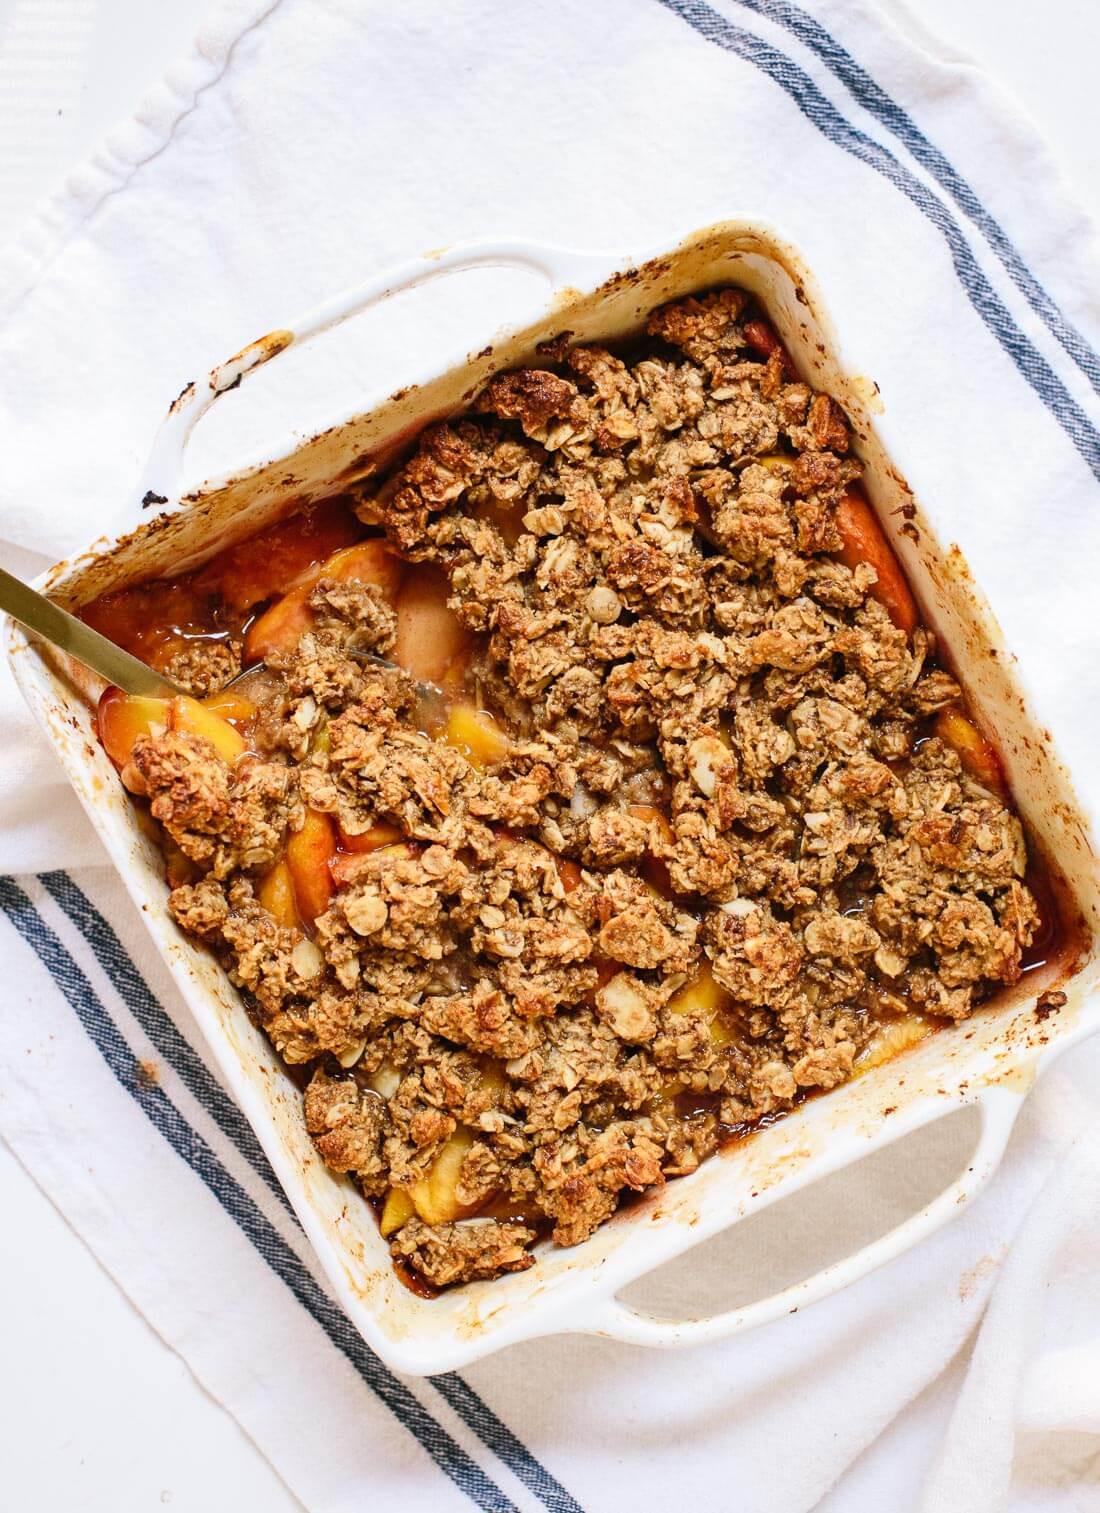 Healthy Peach Recipes  Gluten Free Peach Crisp Recipe Cookie and Kate